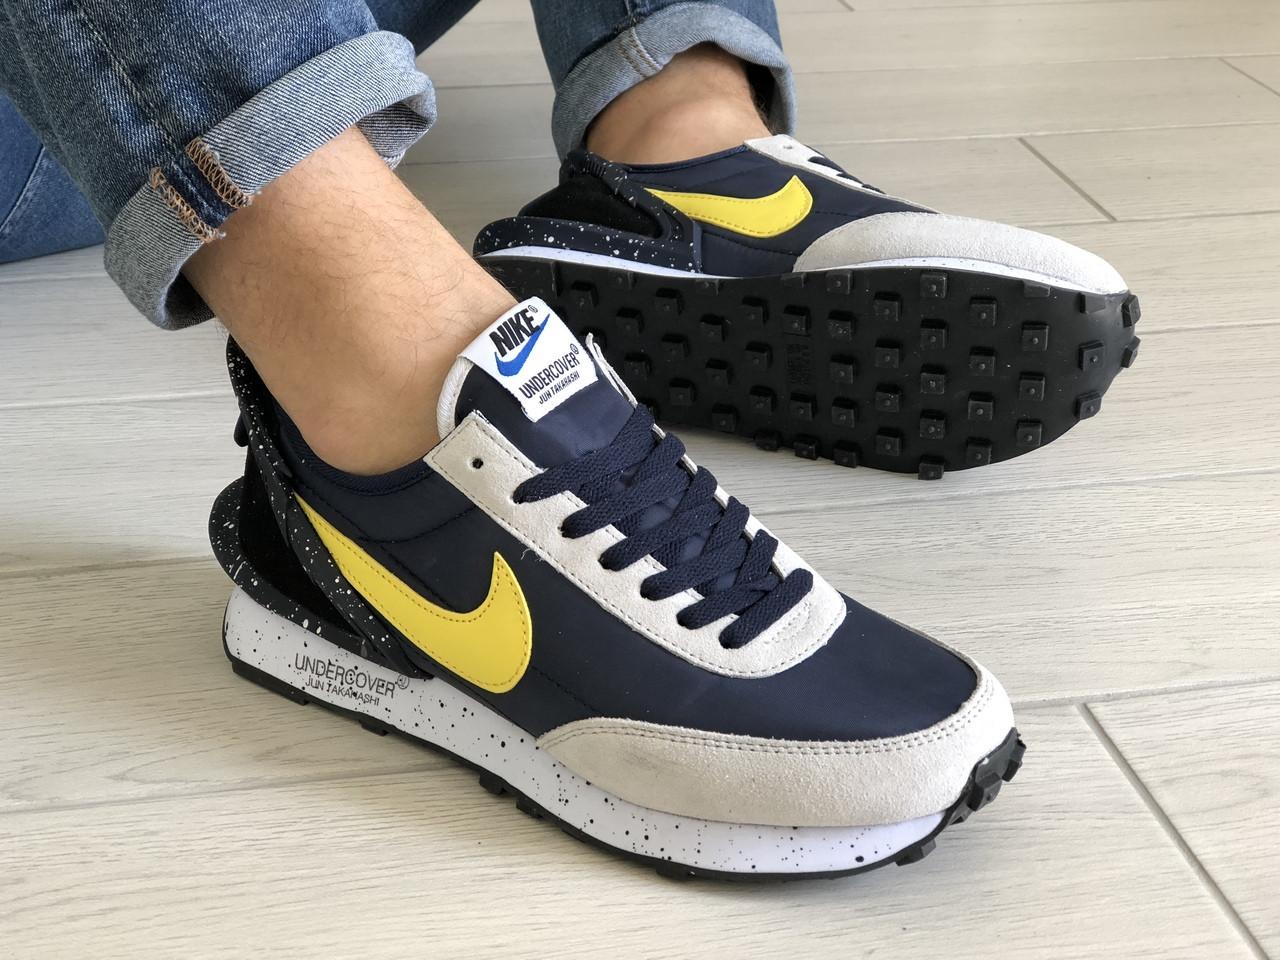 Мужские кроссовки Nike Undercover Jun Takahashi (темно-синие с желтым) 9226